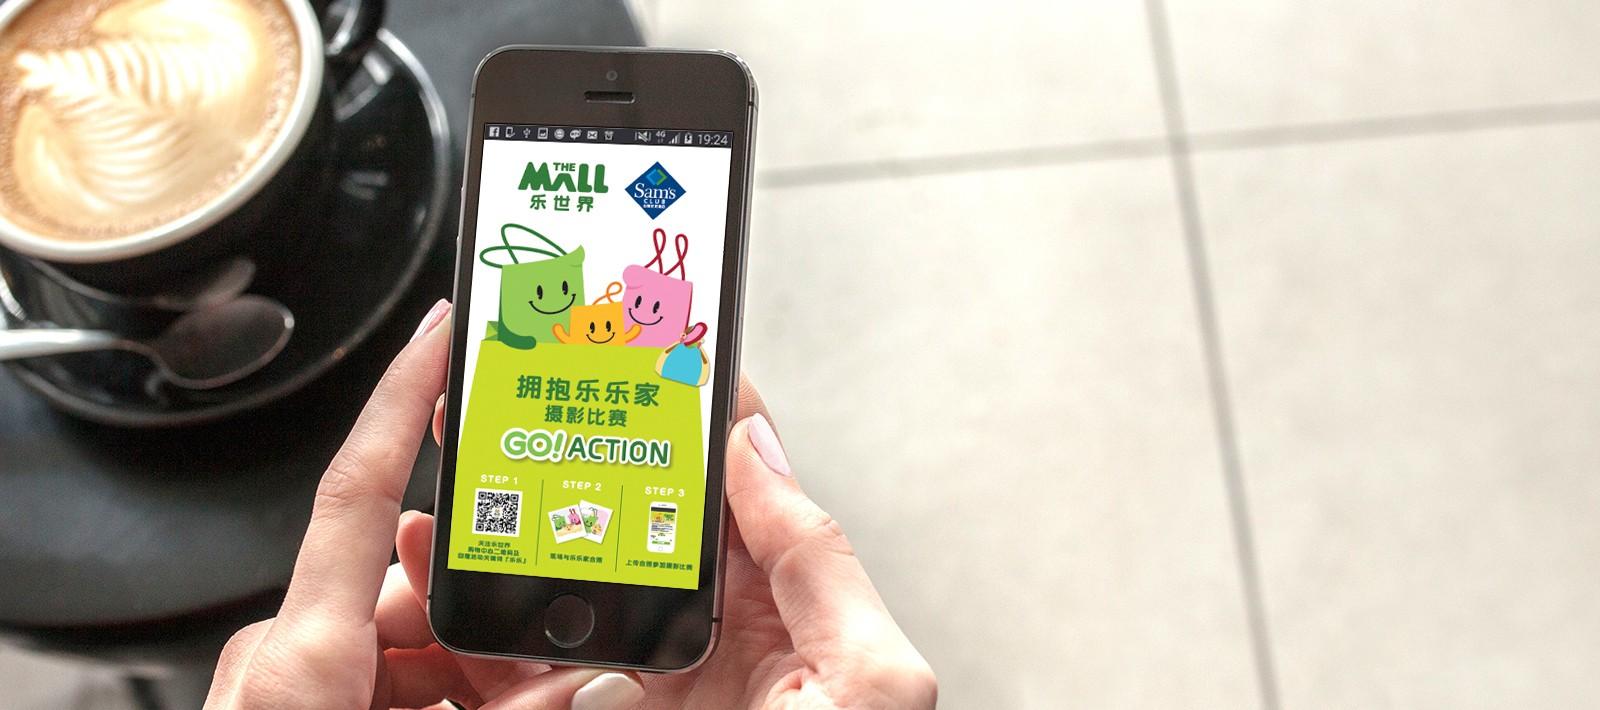 App development for Walmart The mall